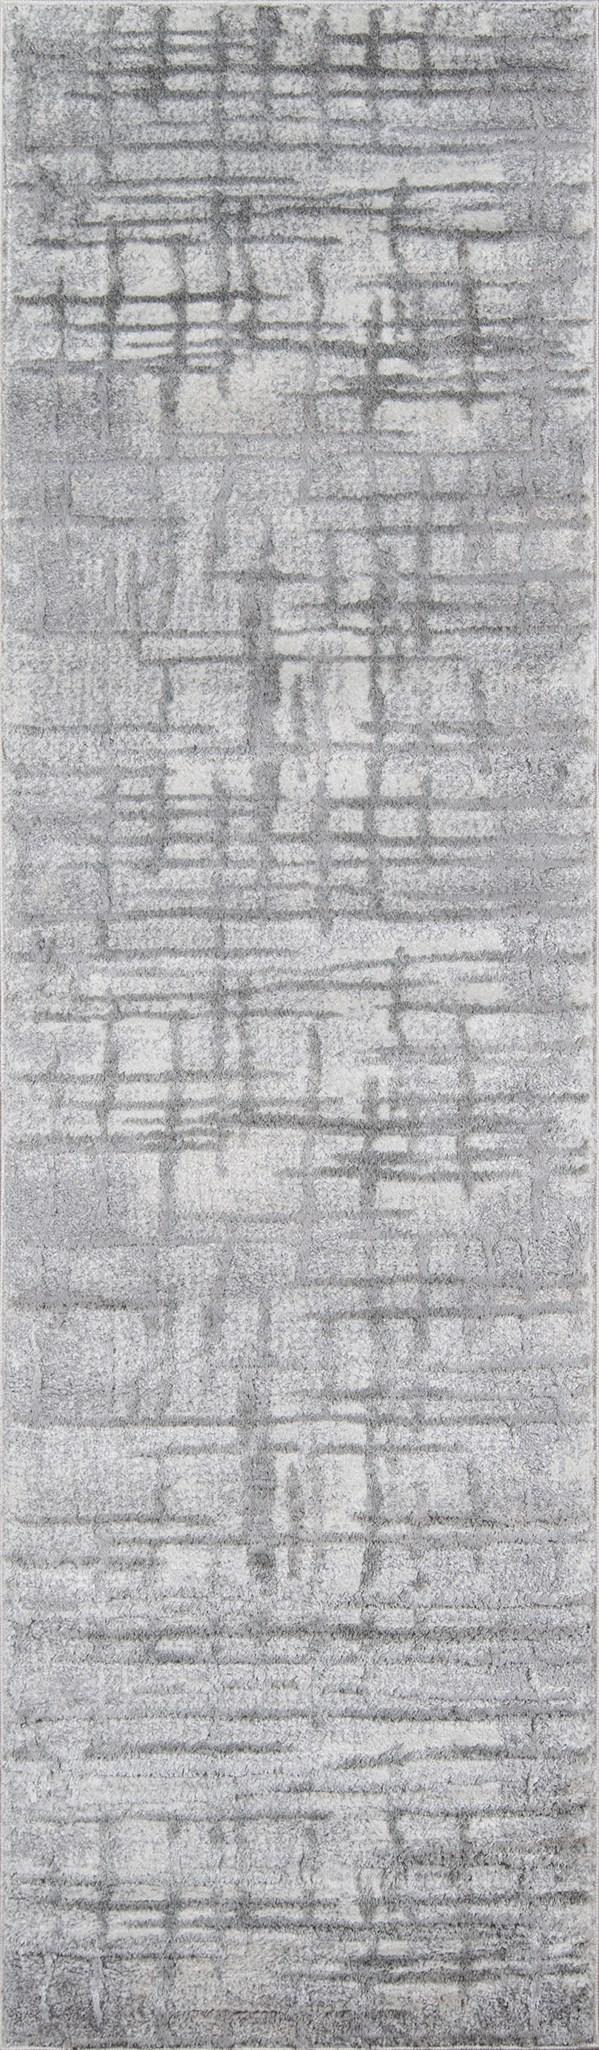 Grey Contemporary / Modern Area Rug